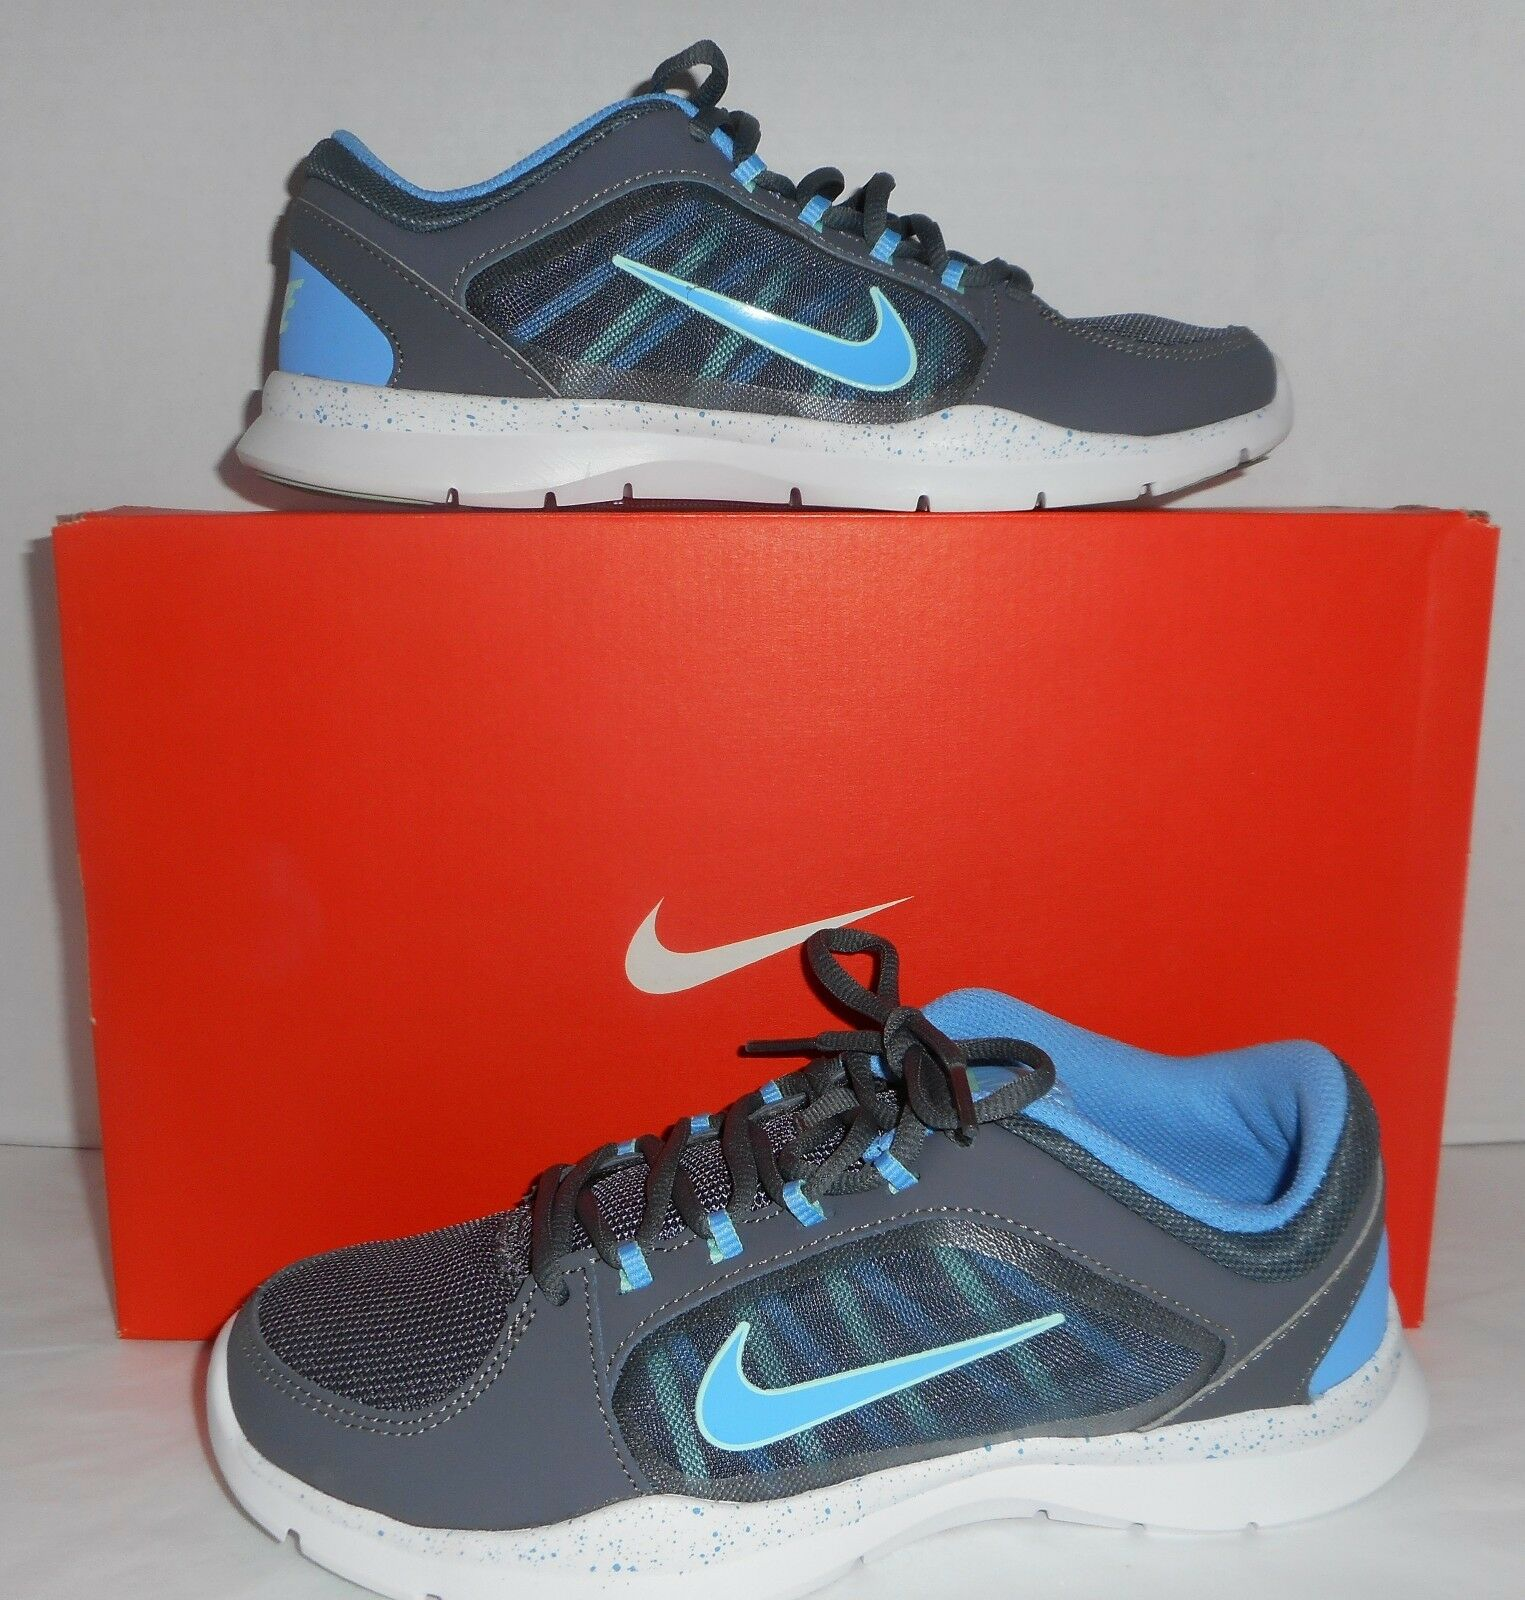 NIB Nike Womens' Flex Trainer 4 Running Shoe Gray/Unsty Blue Sizes 7,  7.5, 8.5